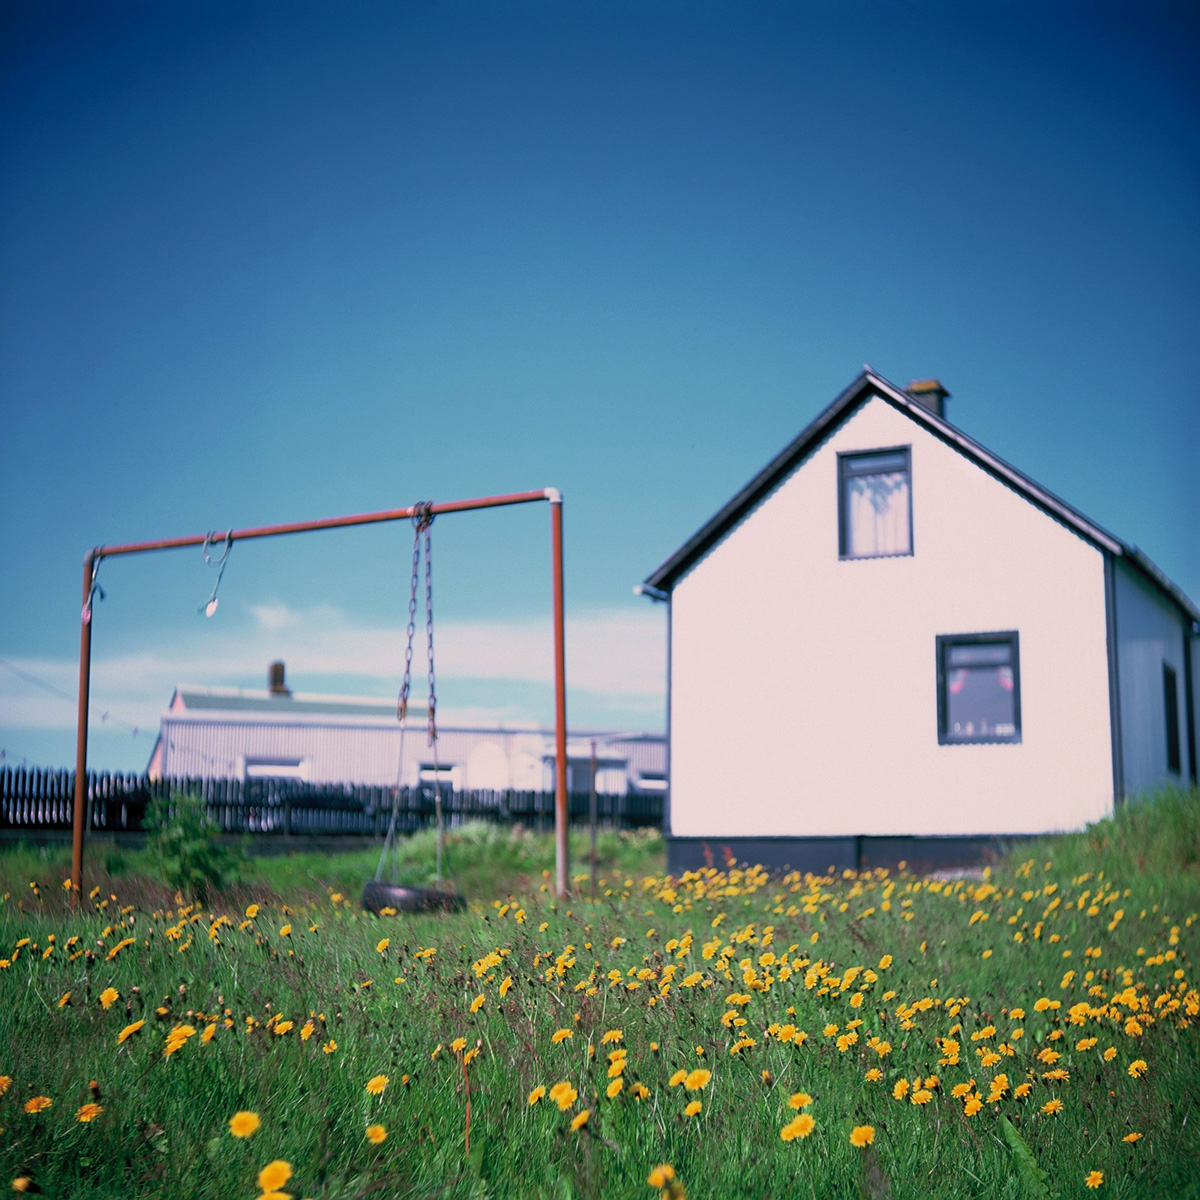 5 Frames With... Fujifilm FUJICHROME Velvia RVP (EI 50 / 120 format / Yashica-635) - by Or Sachs